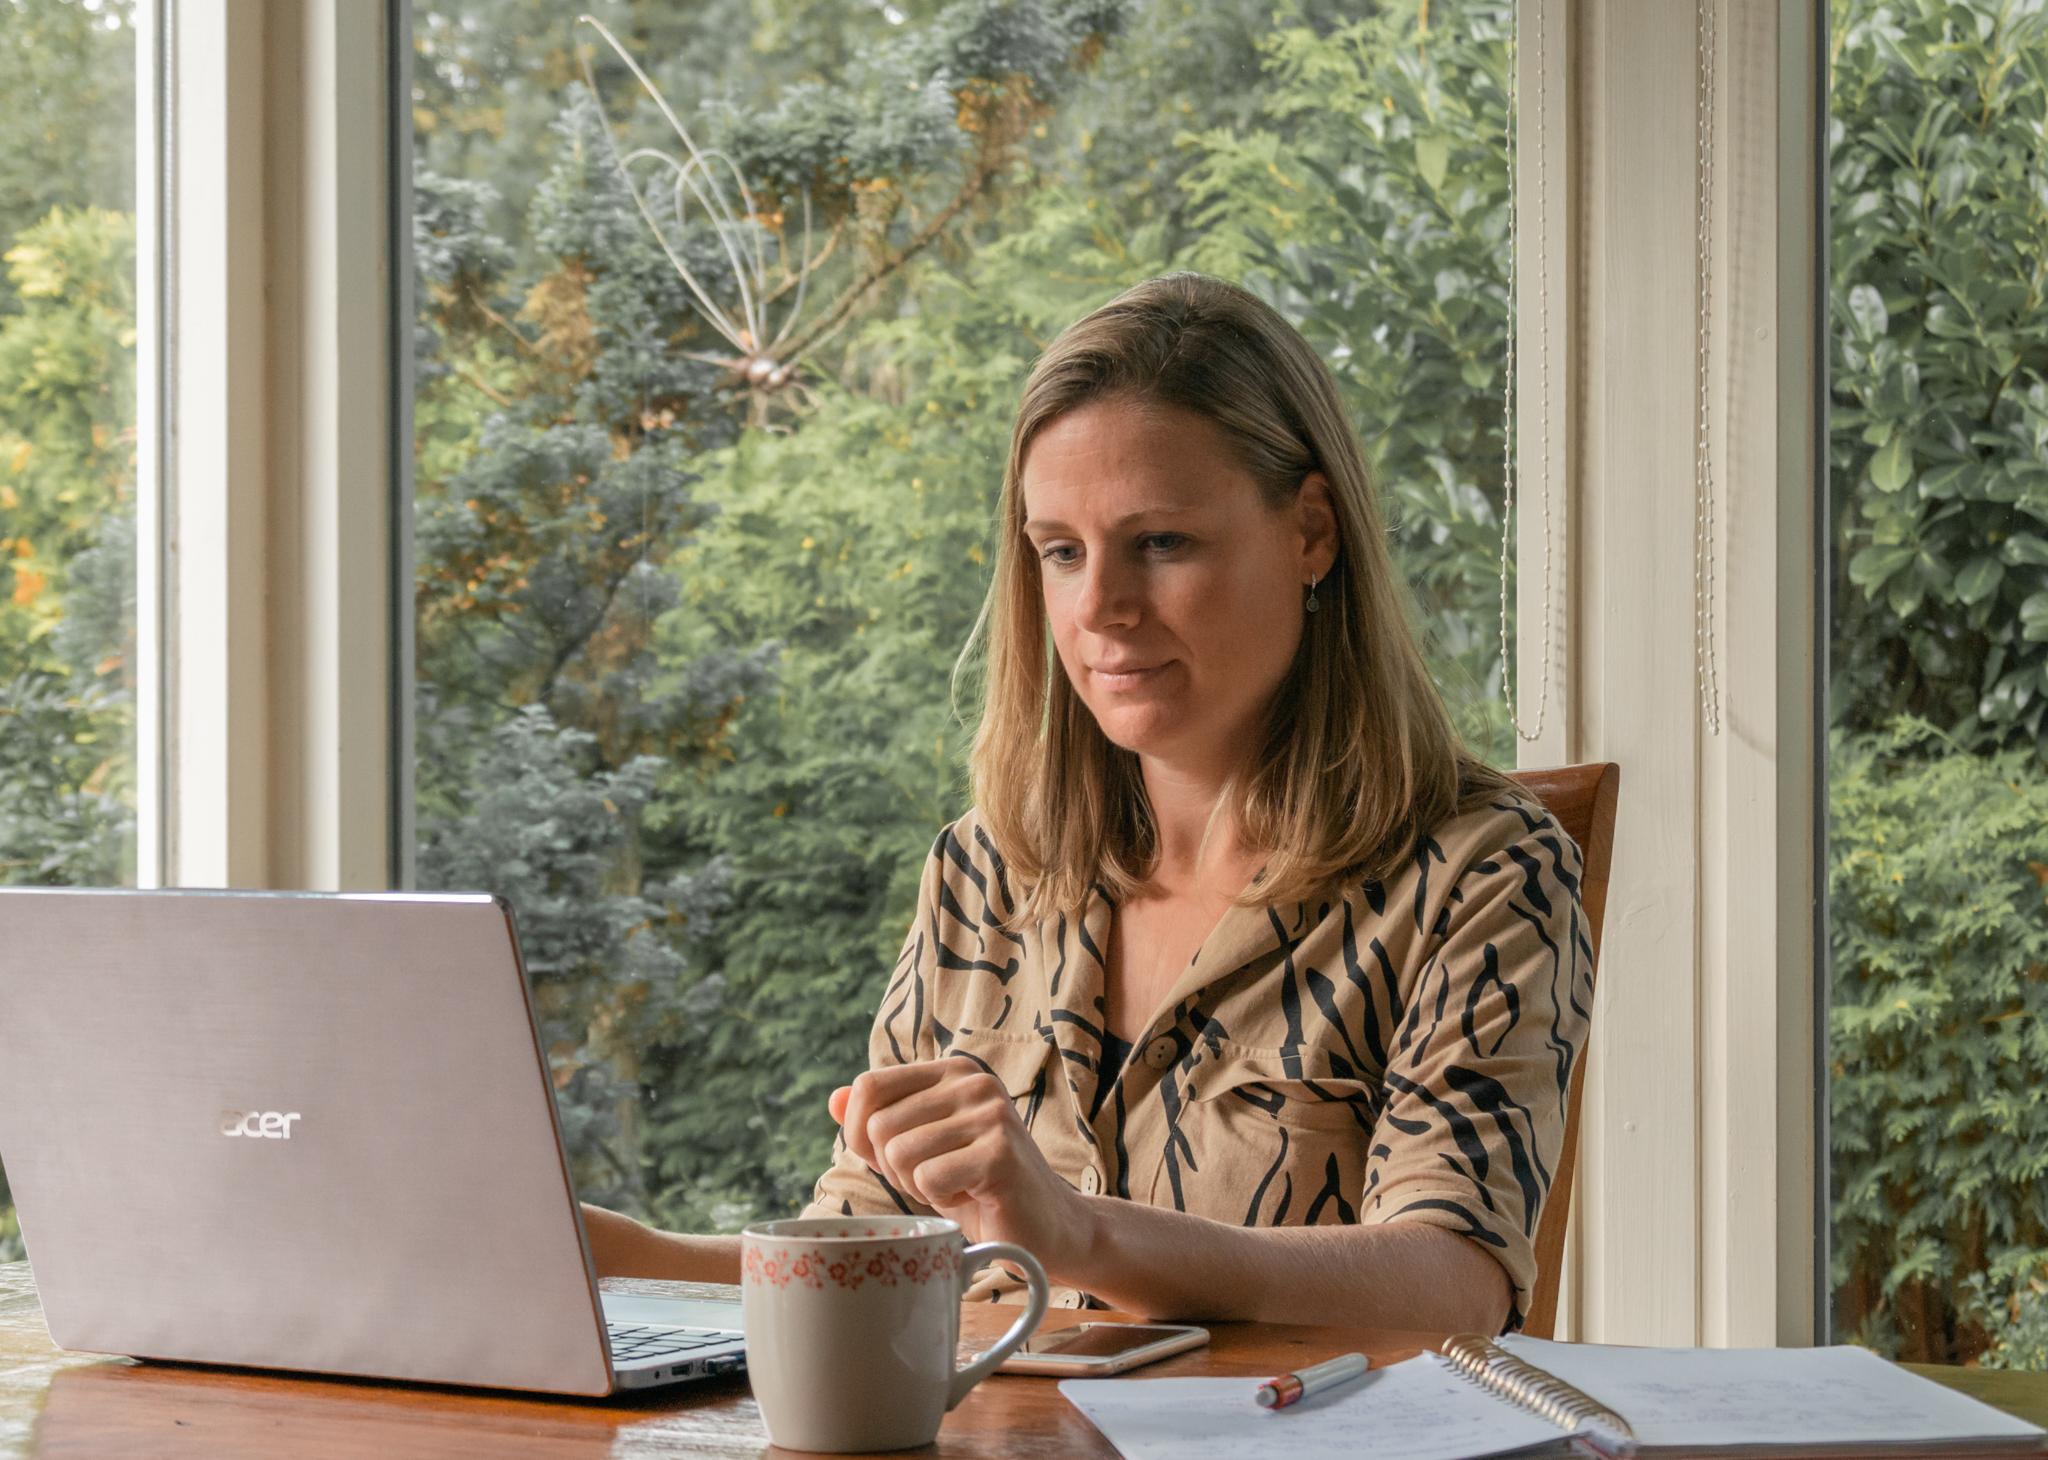 Anja Brouwer-Breukelman AVS-Radiant cursus stralingsbescherming tandarts